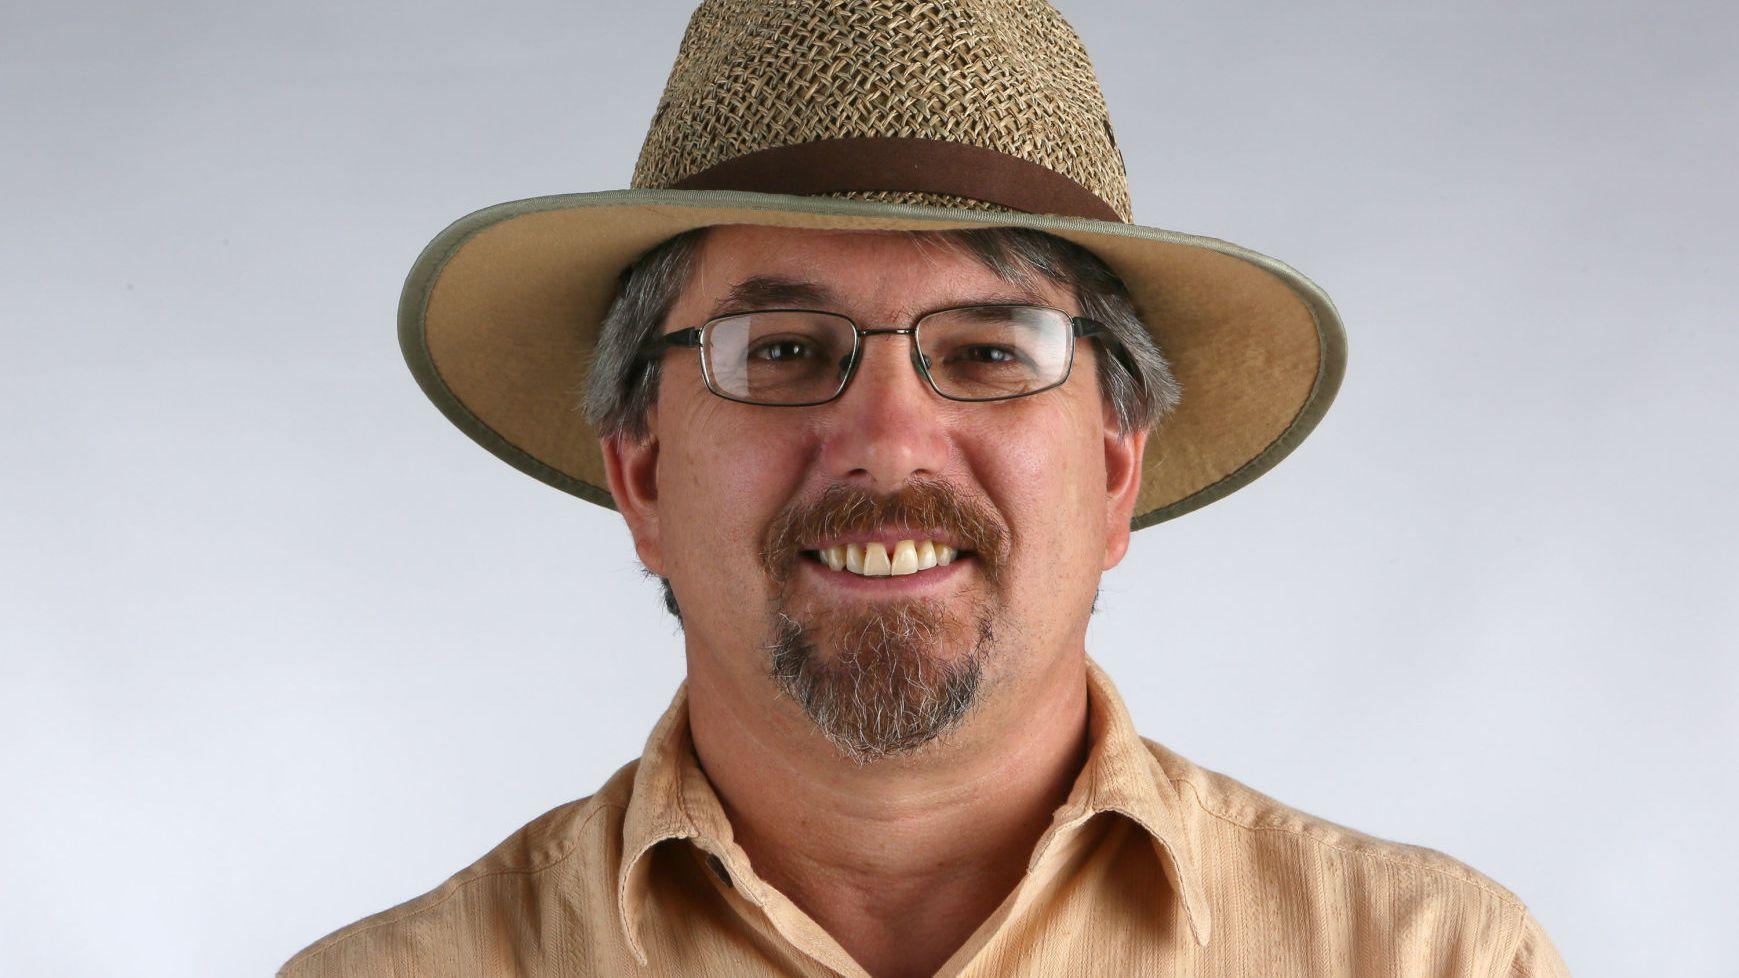 Steller In Tucson S Sizzling Summer Not Just Any Hat Will Do Latest Tim Steller Columns Tucson Com